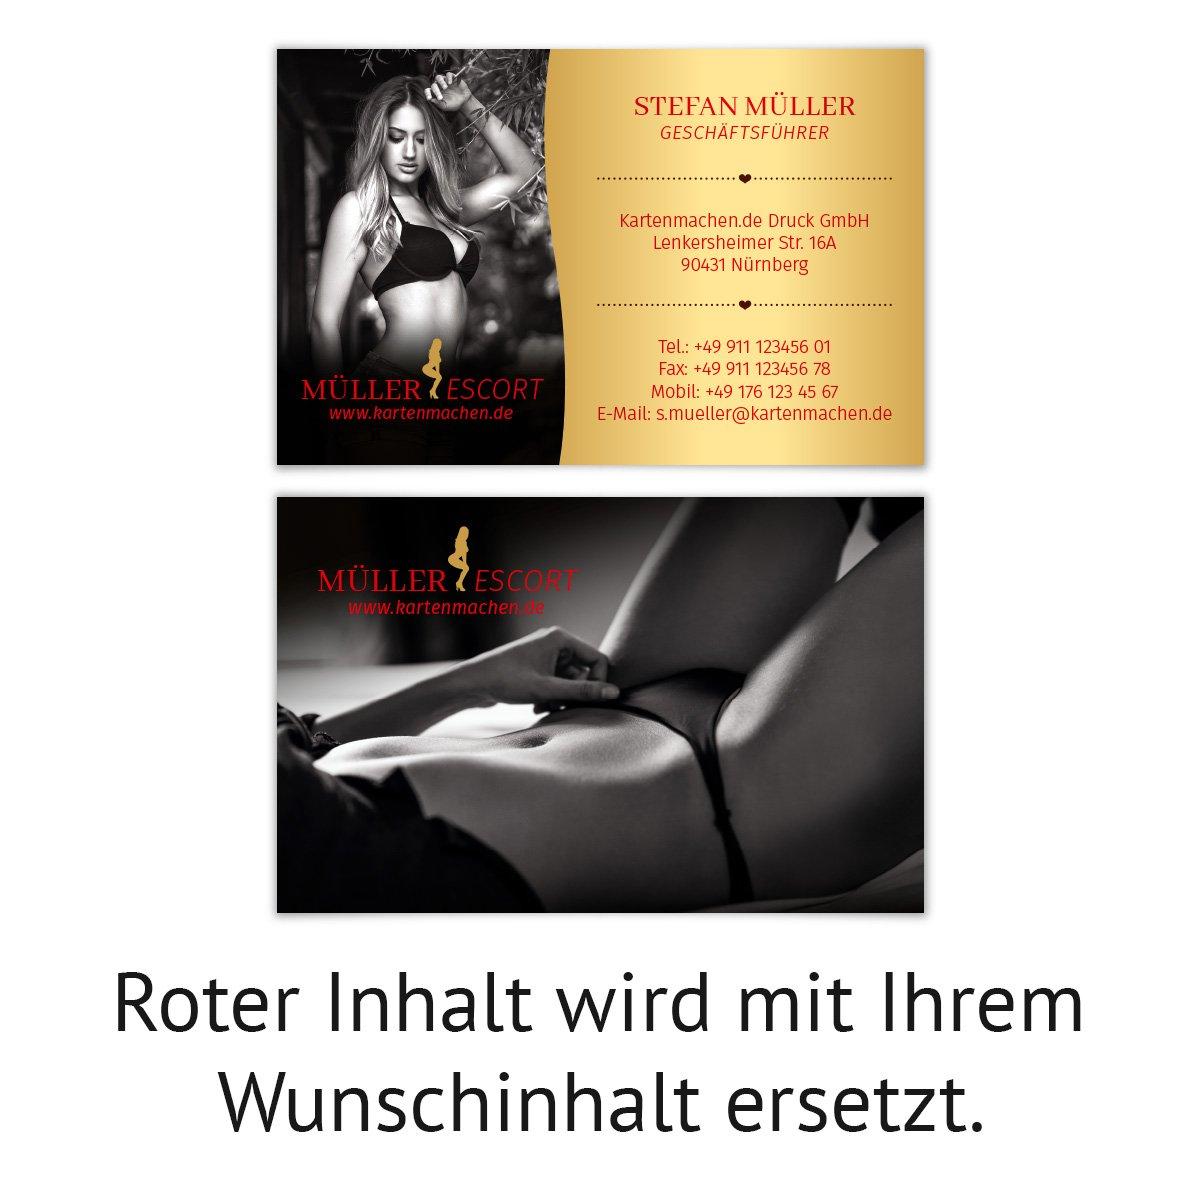 500 x Visitenkarten individuell Business Karten 300g qm 85 85 85 x 55 mm - Escort Sexy Dessous B07F46LGTF   Schön geformt    Haltbarer Service    Großer Verkauf  5ce0fd